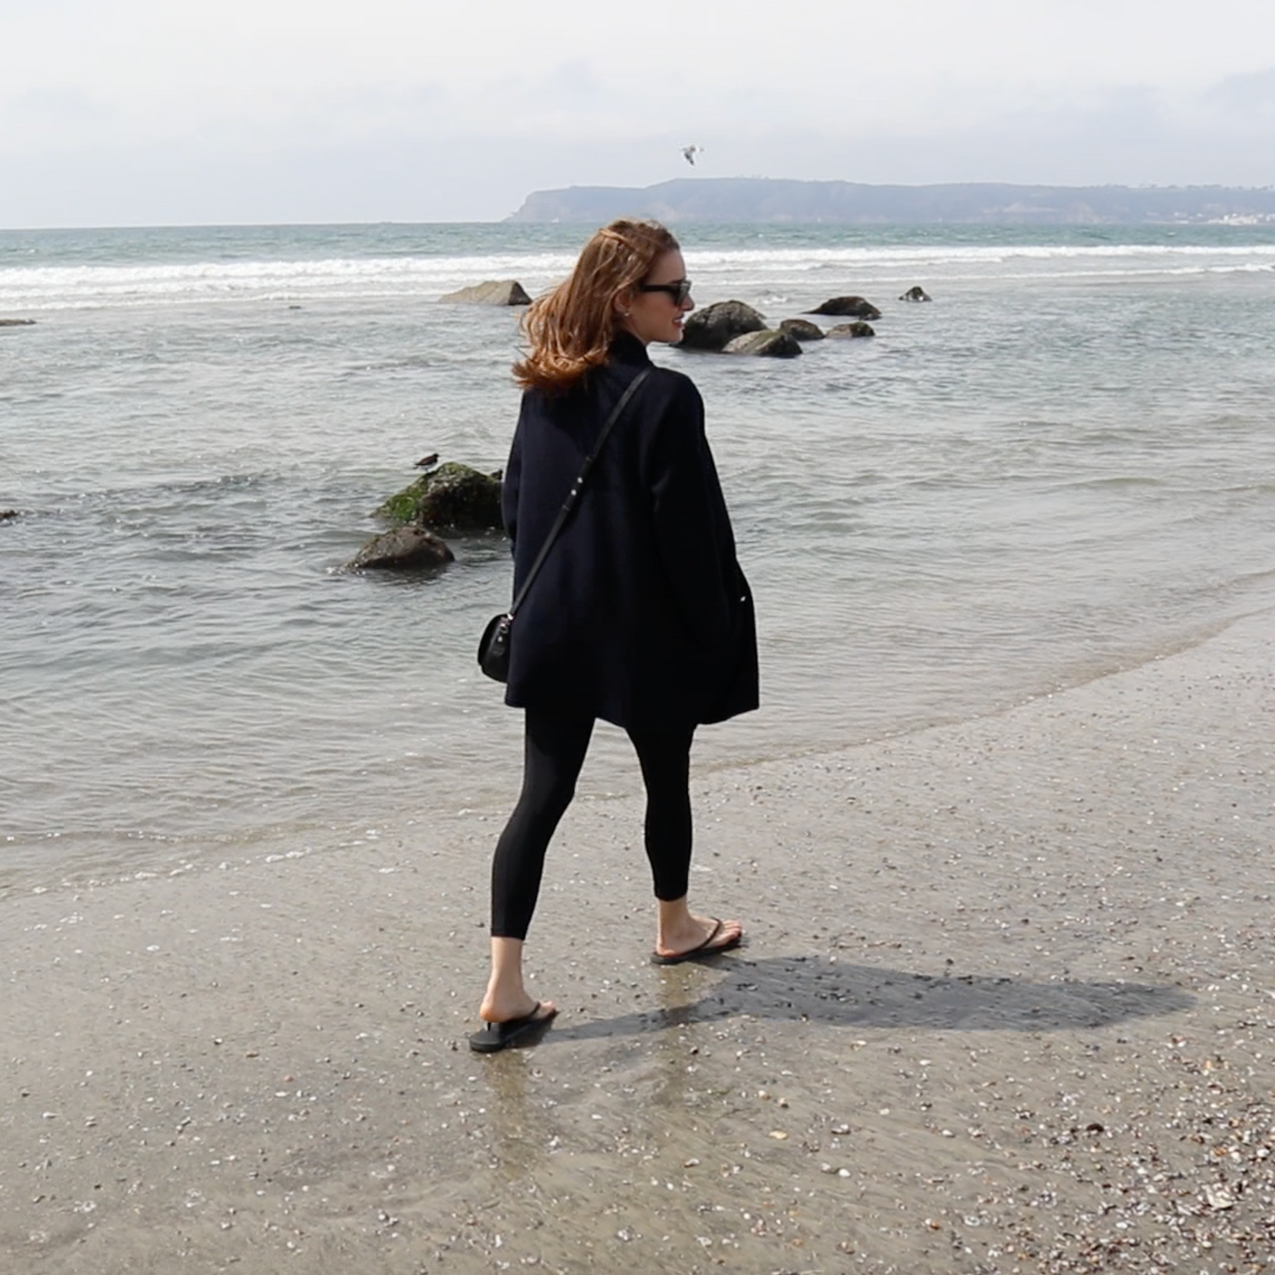 Walking on Coronado Beach